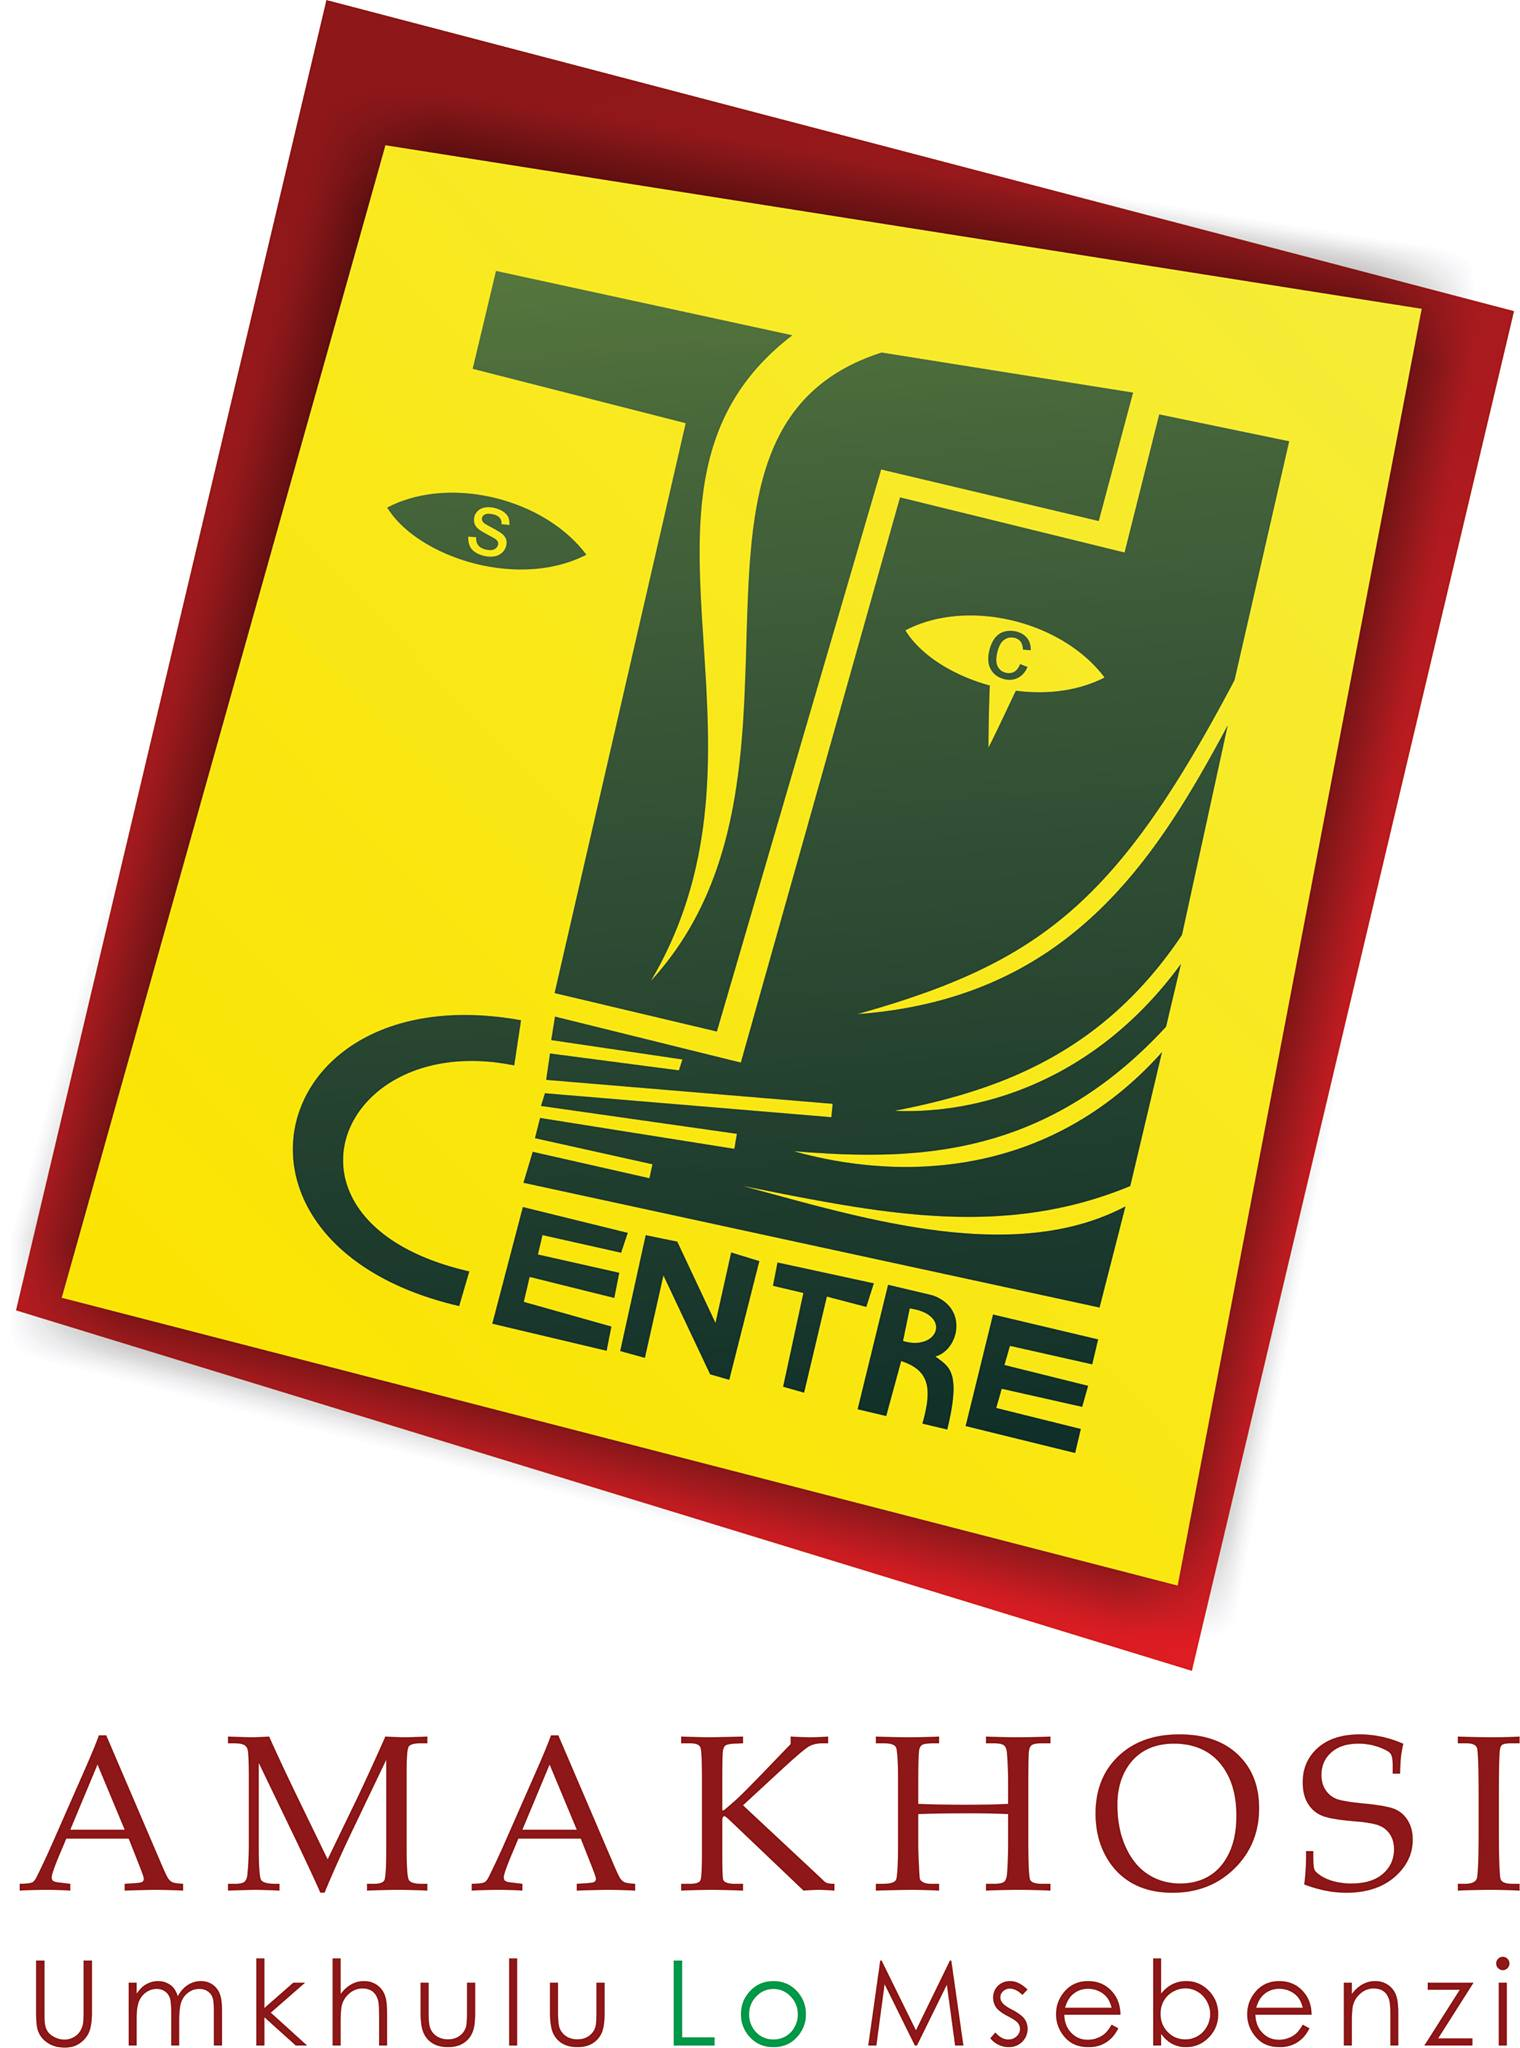 Amakhosi Cultural Centre